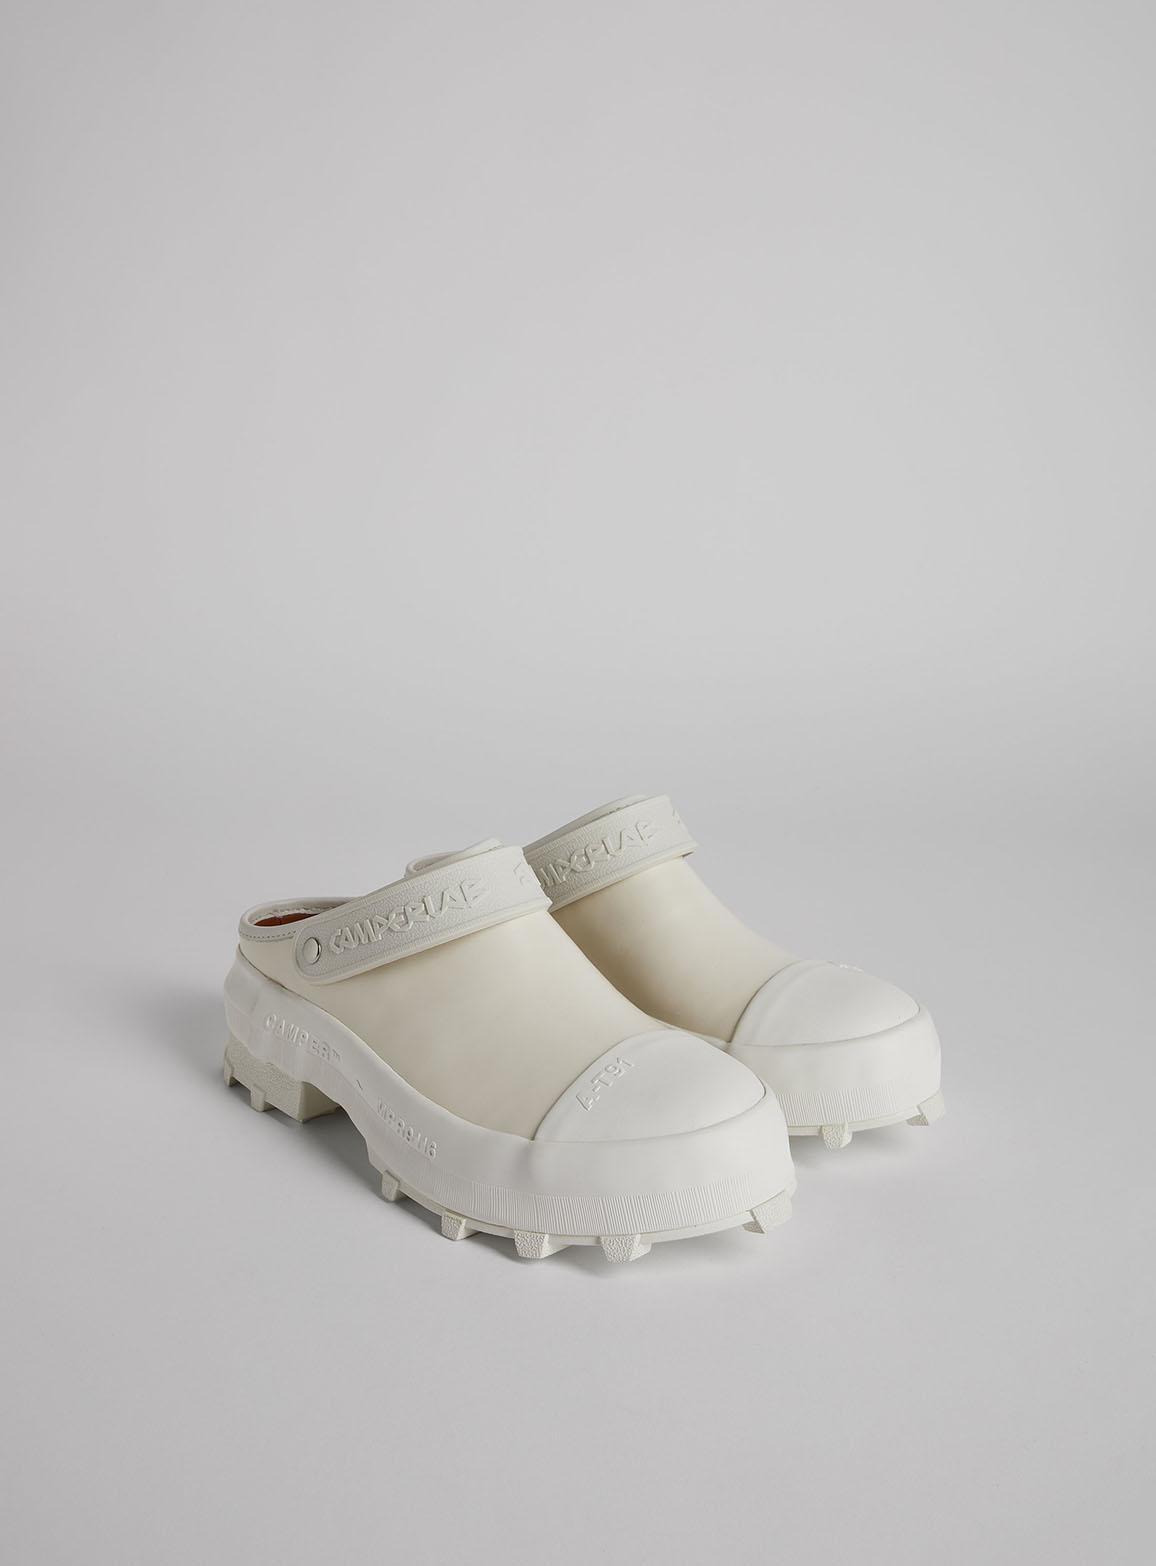 Traktori white shoes